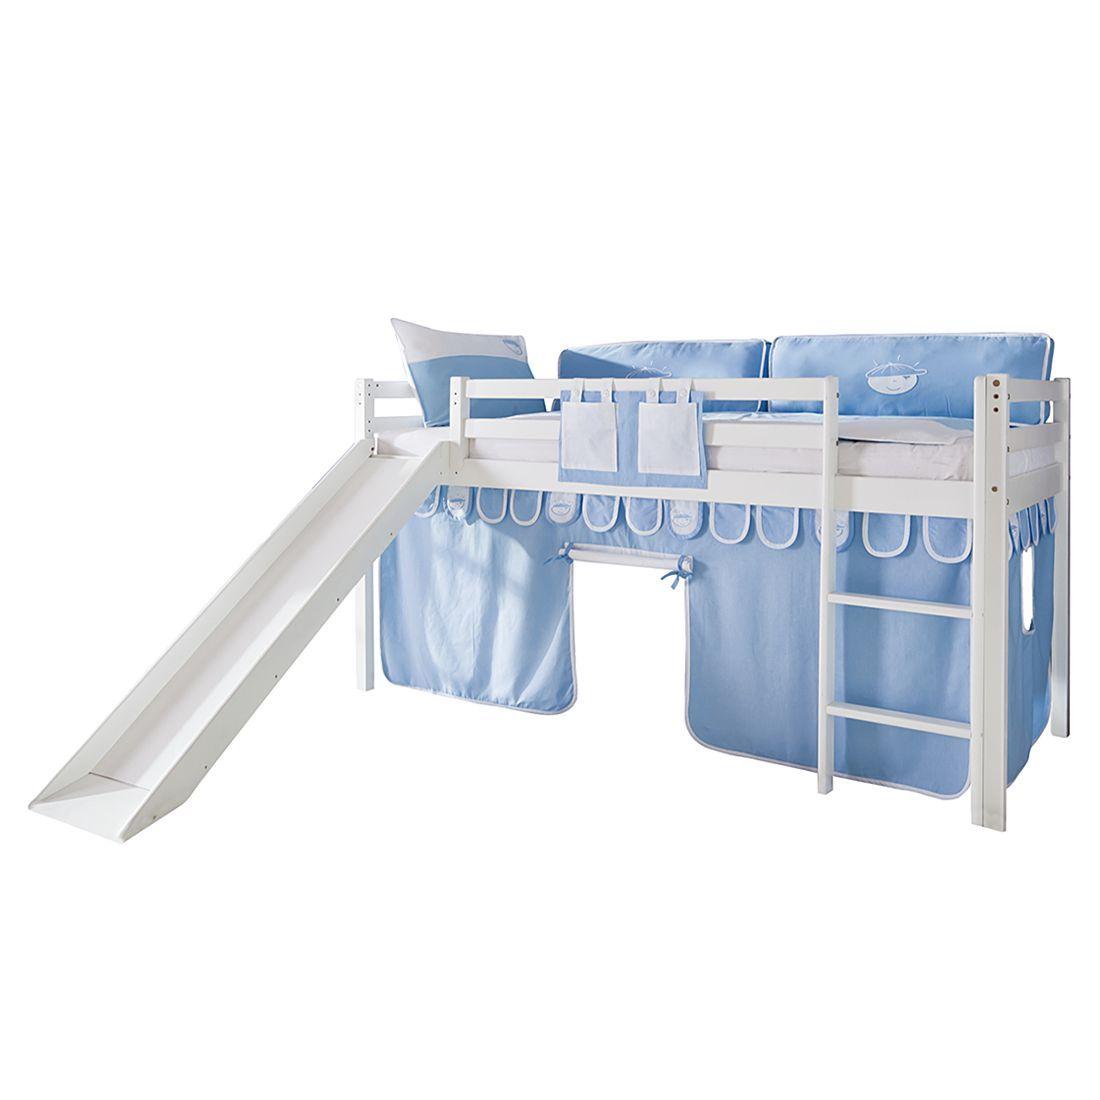 Spielbett Toby - Massivholz Buche - Weiß lackiert - mit Rutsche und Textilset - Weiß lackiert mit Textilset Blau/Boy ohne Turm, Relita Jetzt bestellen unter: https://moebel.ladendirekt.de/kinderzimmer/betten/hochbetten/?uid=5c299618-c9a3-53ff-8915-7e40bd99ee9e&utm_source=pinterest&utm_medium=pin&utm_campaign=boards #möbel #kinderzimmer #hochbetten #relita #teens #betten #kids